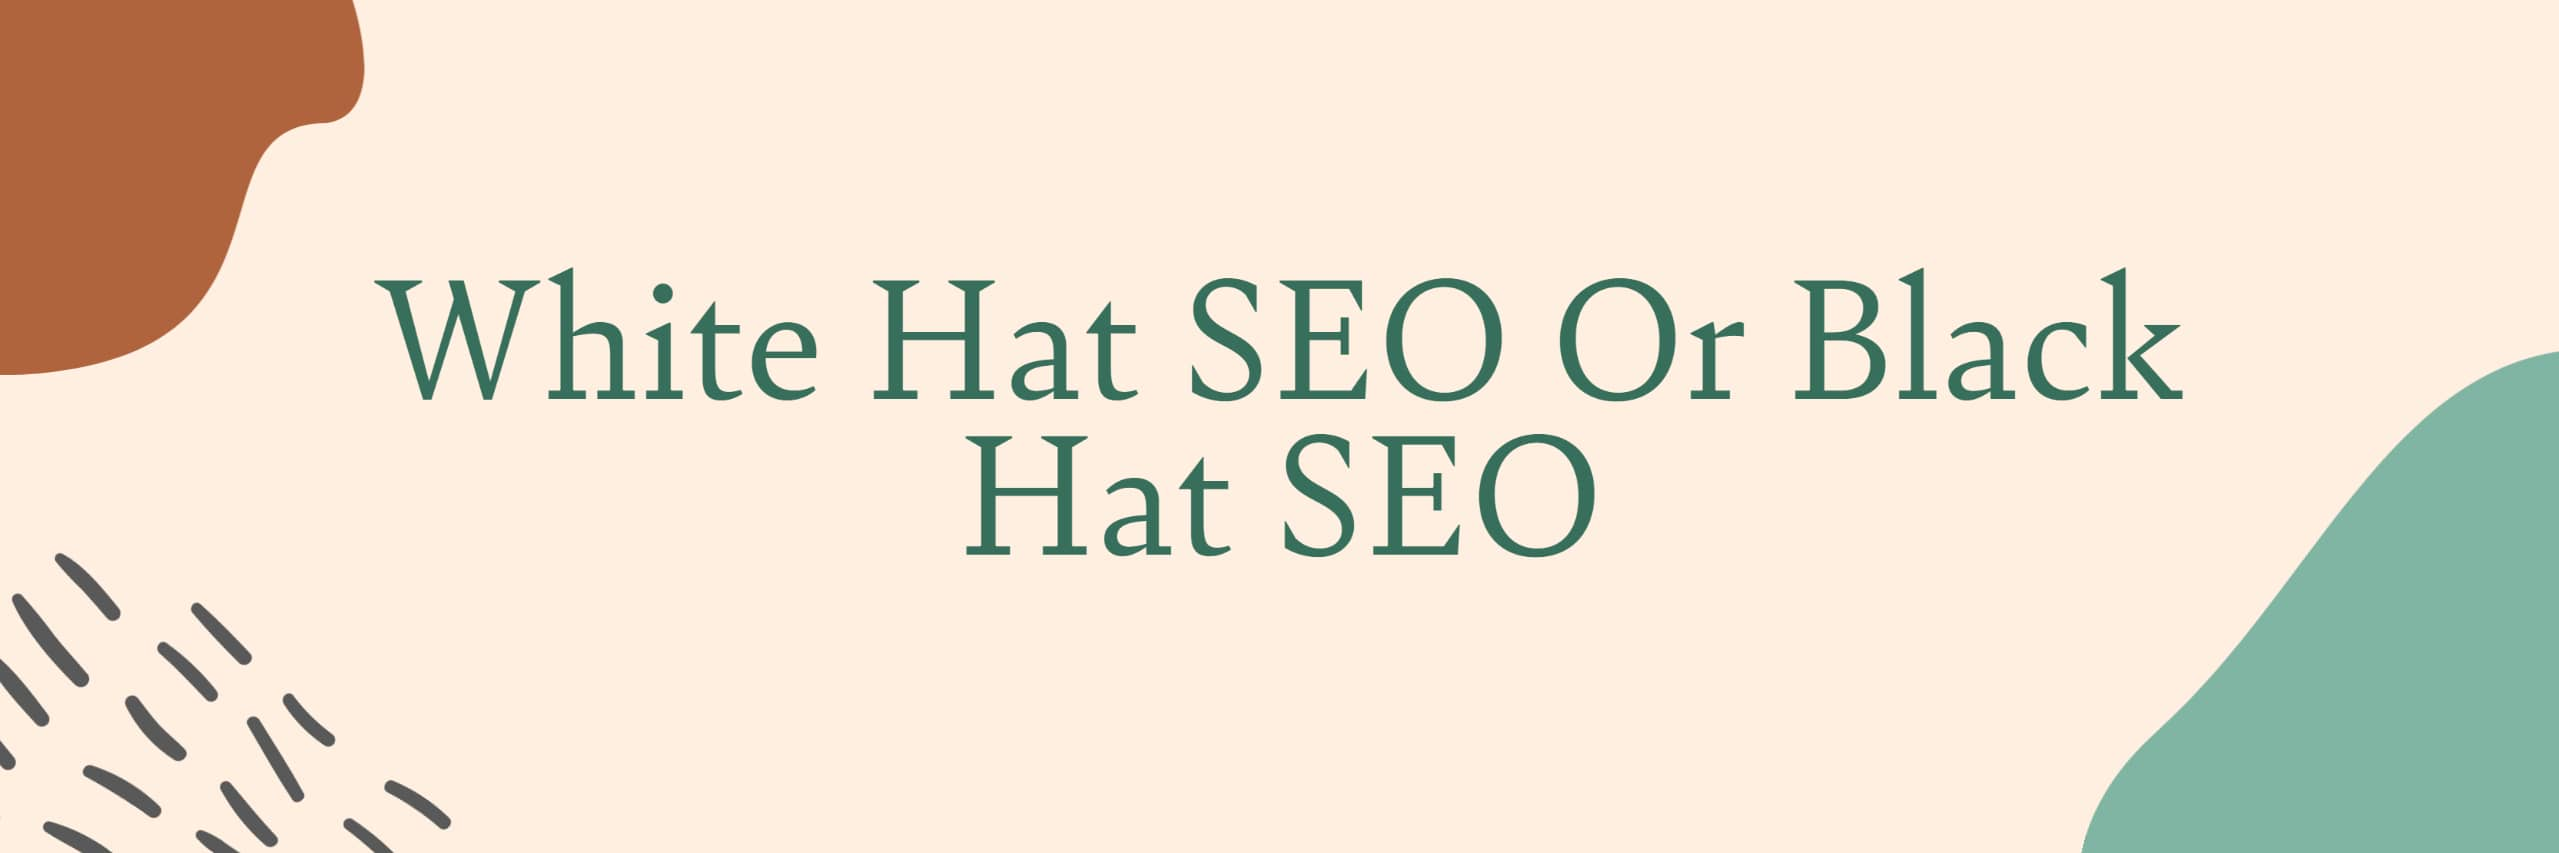 White Hat SEO or Black Hat SEO